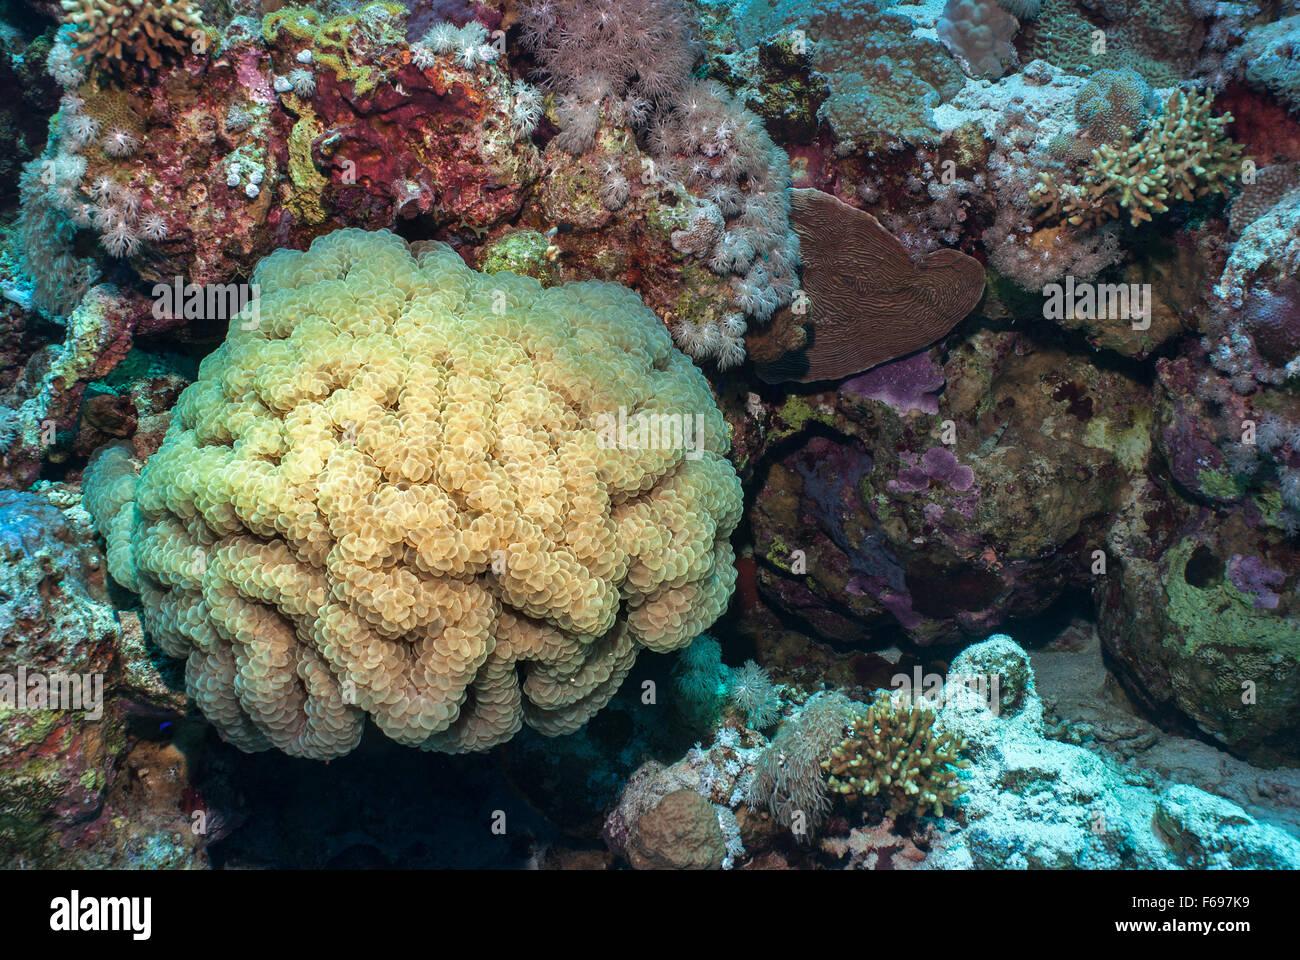 Burbuja, Plerogyra sinuosa coral, Caryophylliidae, Sharm el Sheikh, Mar Rojo, Egipto Imagen De Stock